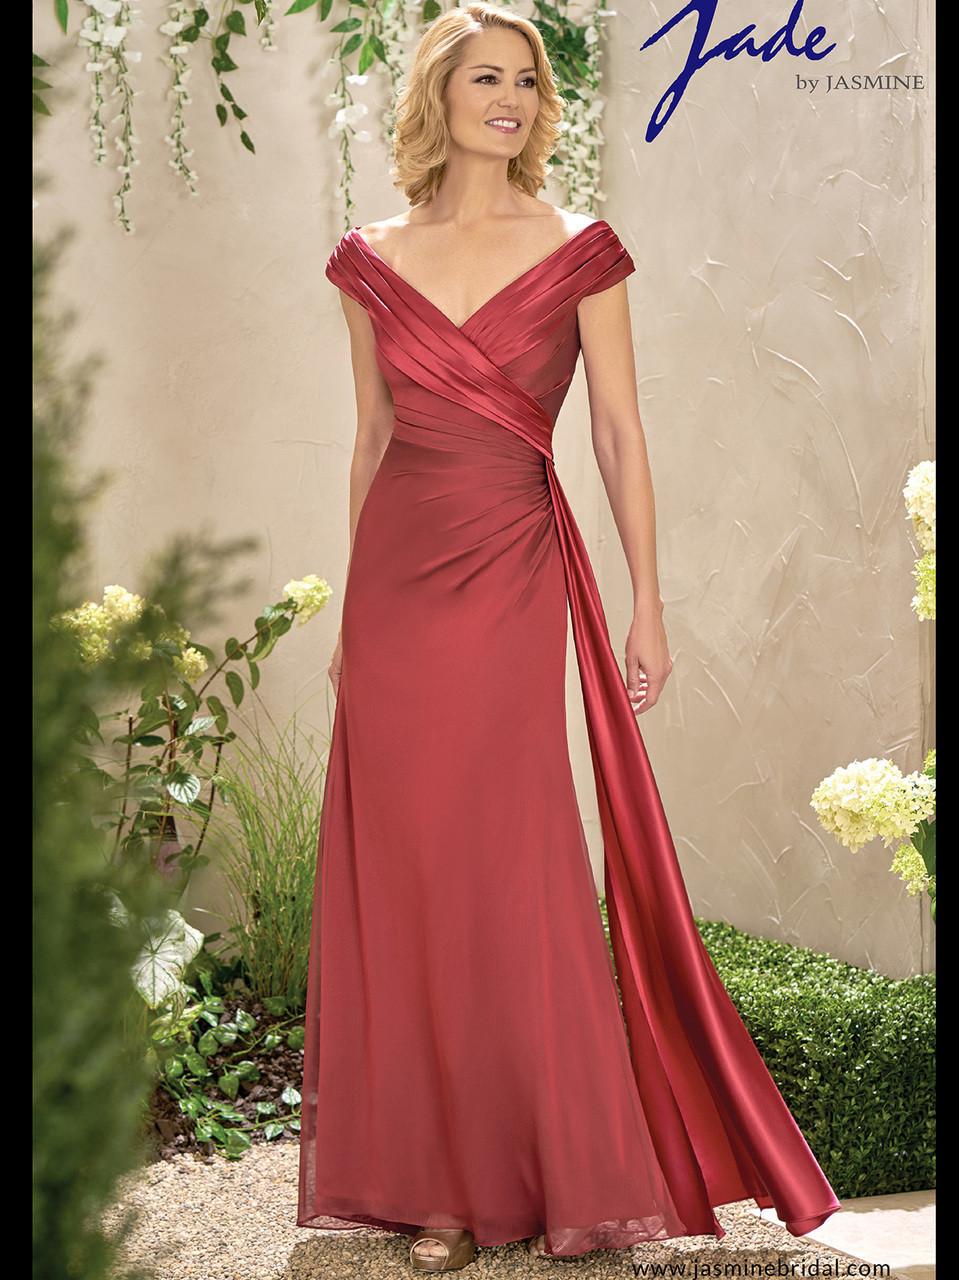 02585b24fe6 Jasmine Mother of the Bride Dresses – Fashion dresses